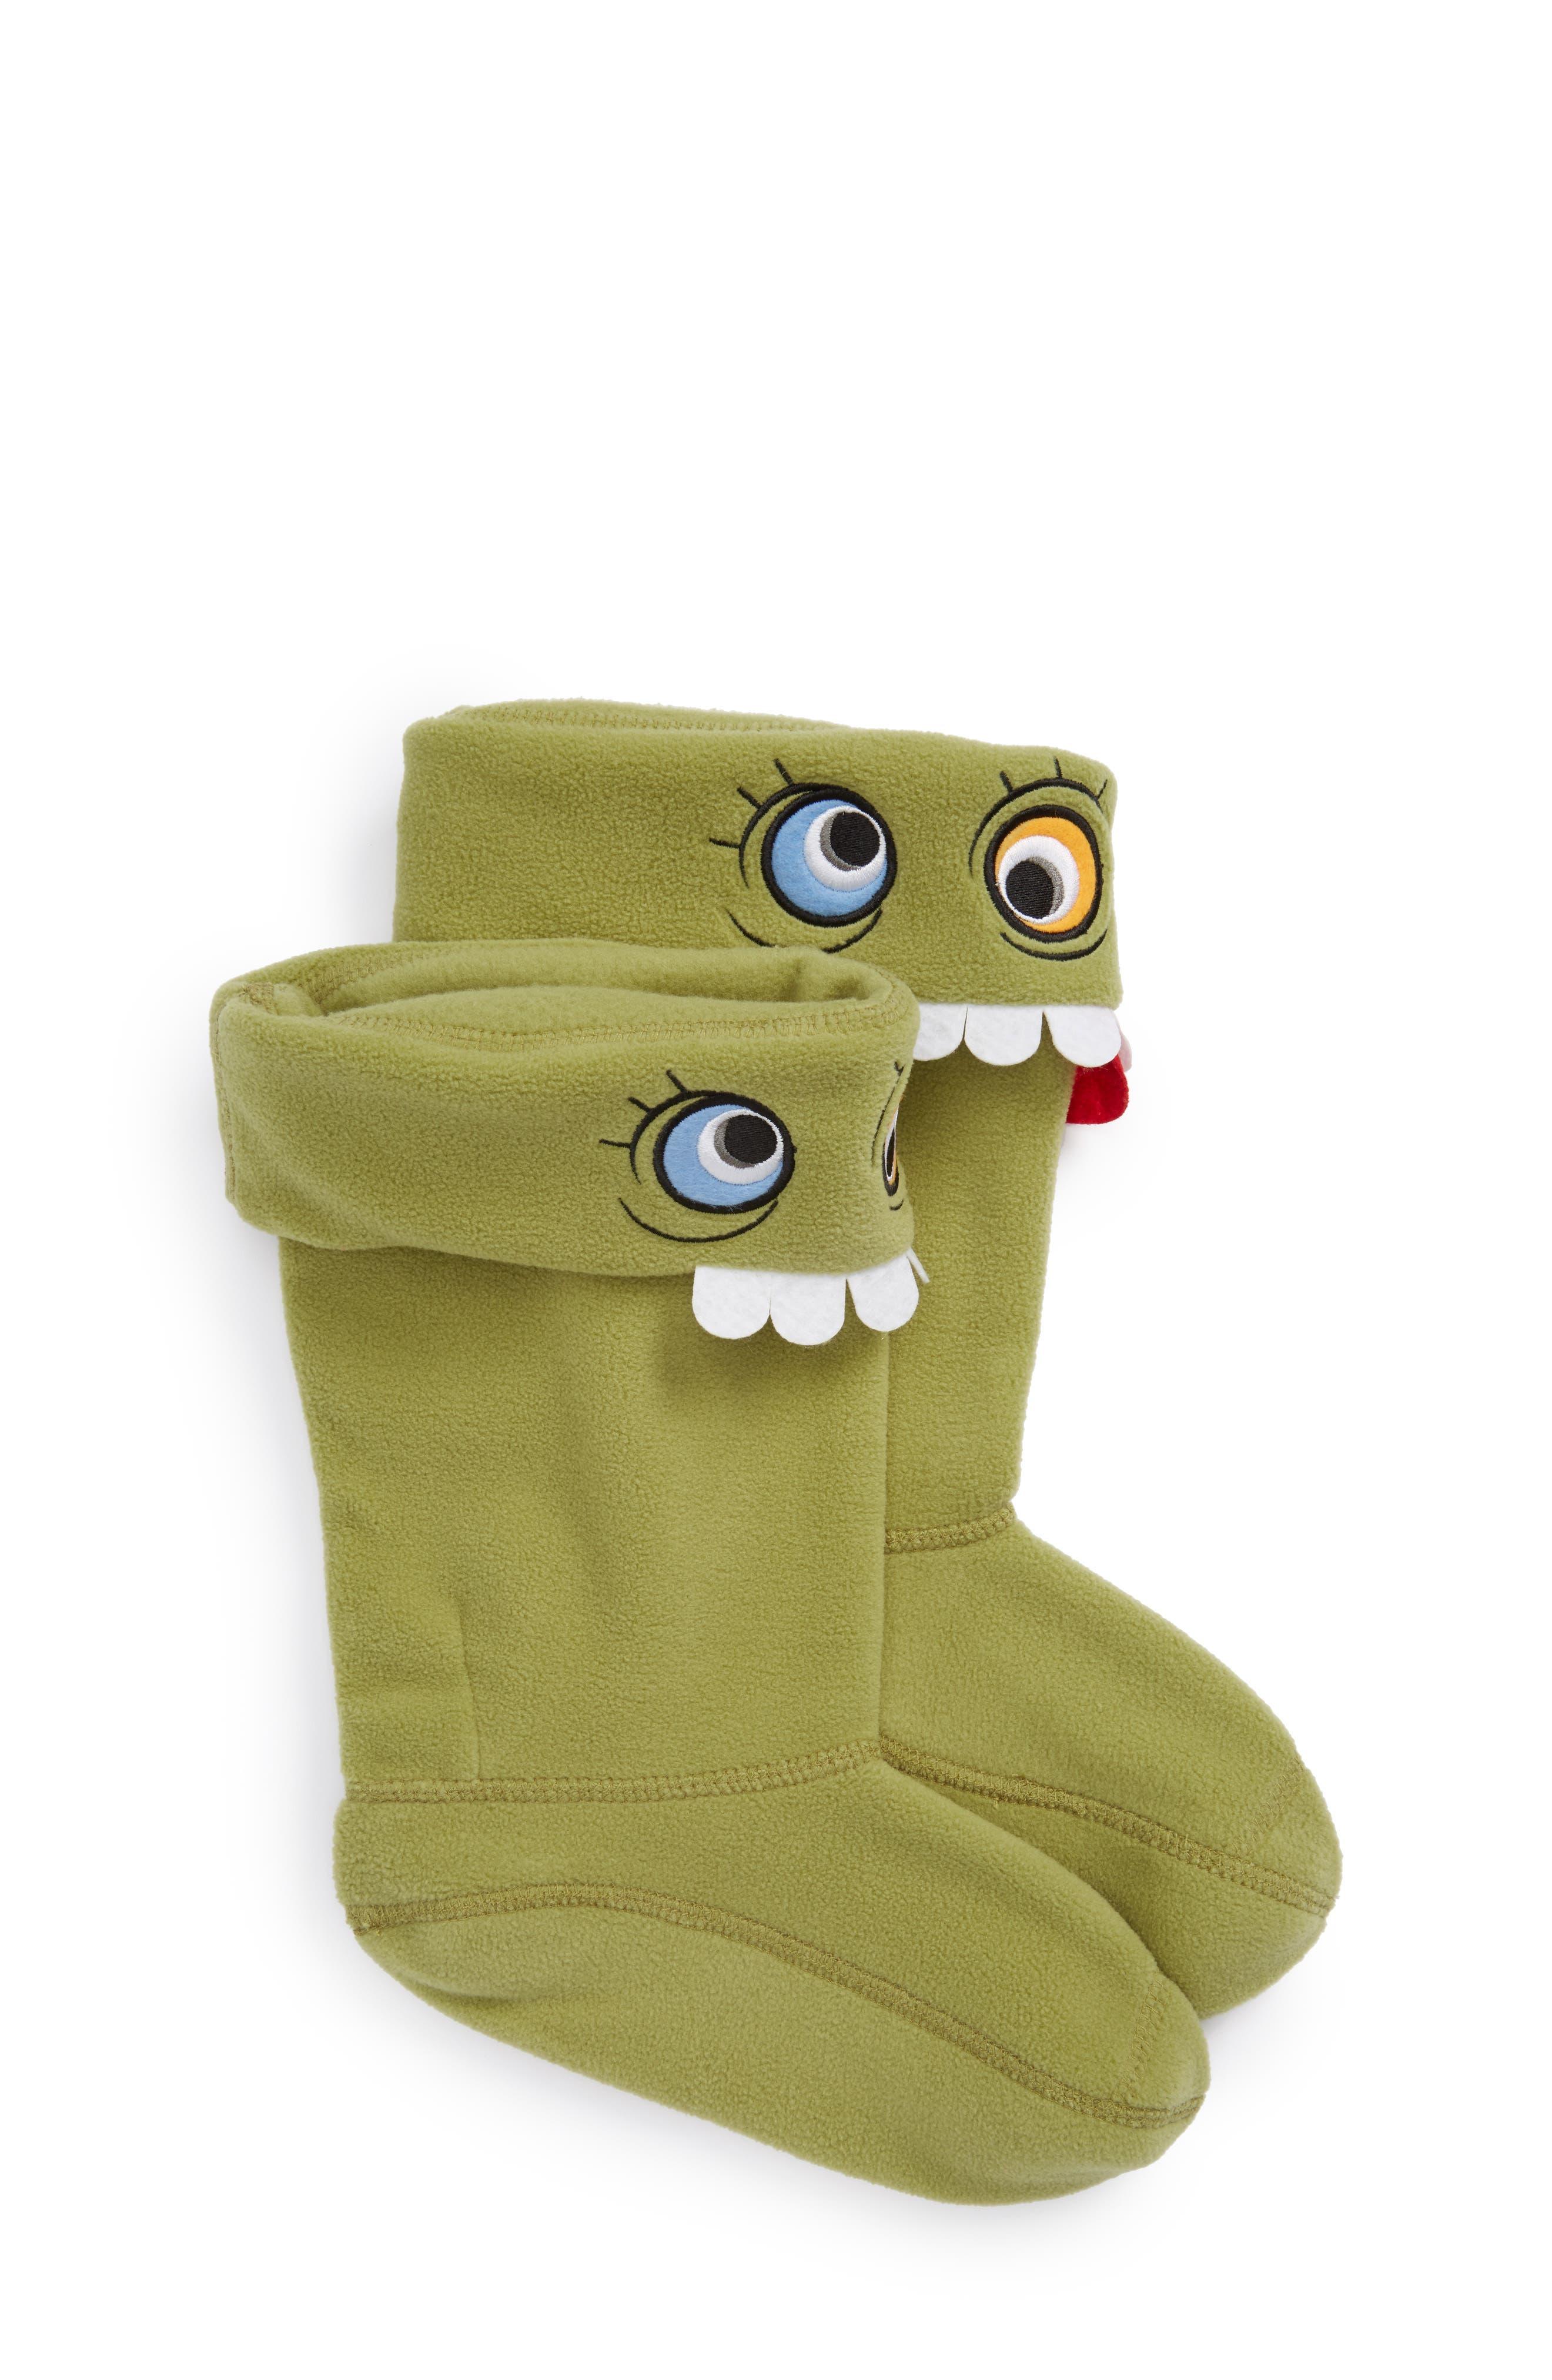 Alternate Image 1 Selected - Hunter Alien Cuff Boot Socks (Baby, Walker, Toddler, Little Kid & Big Kid)